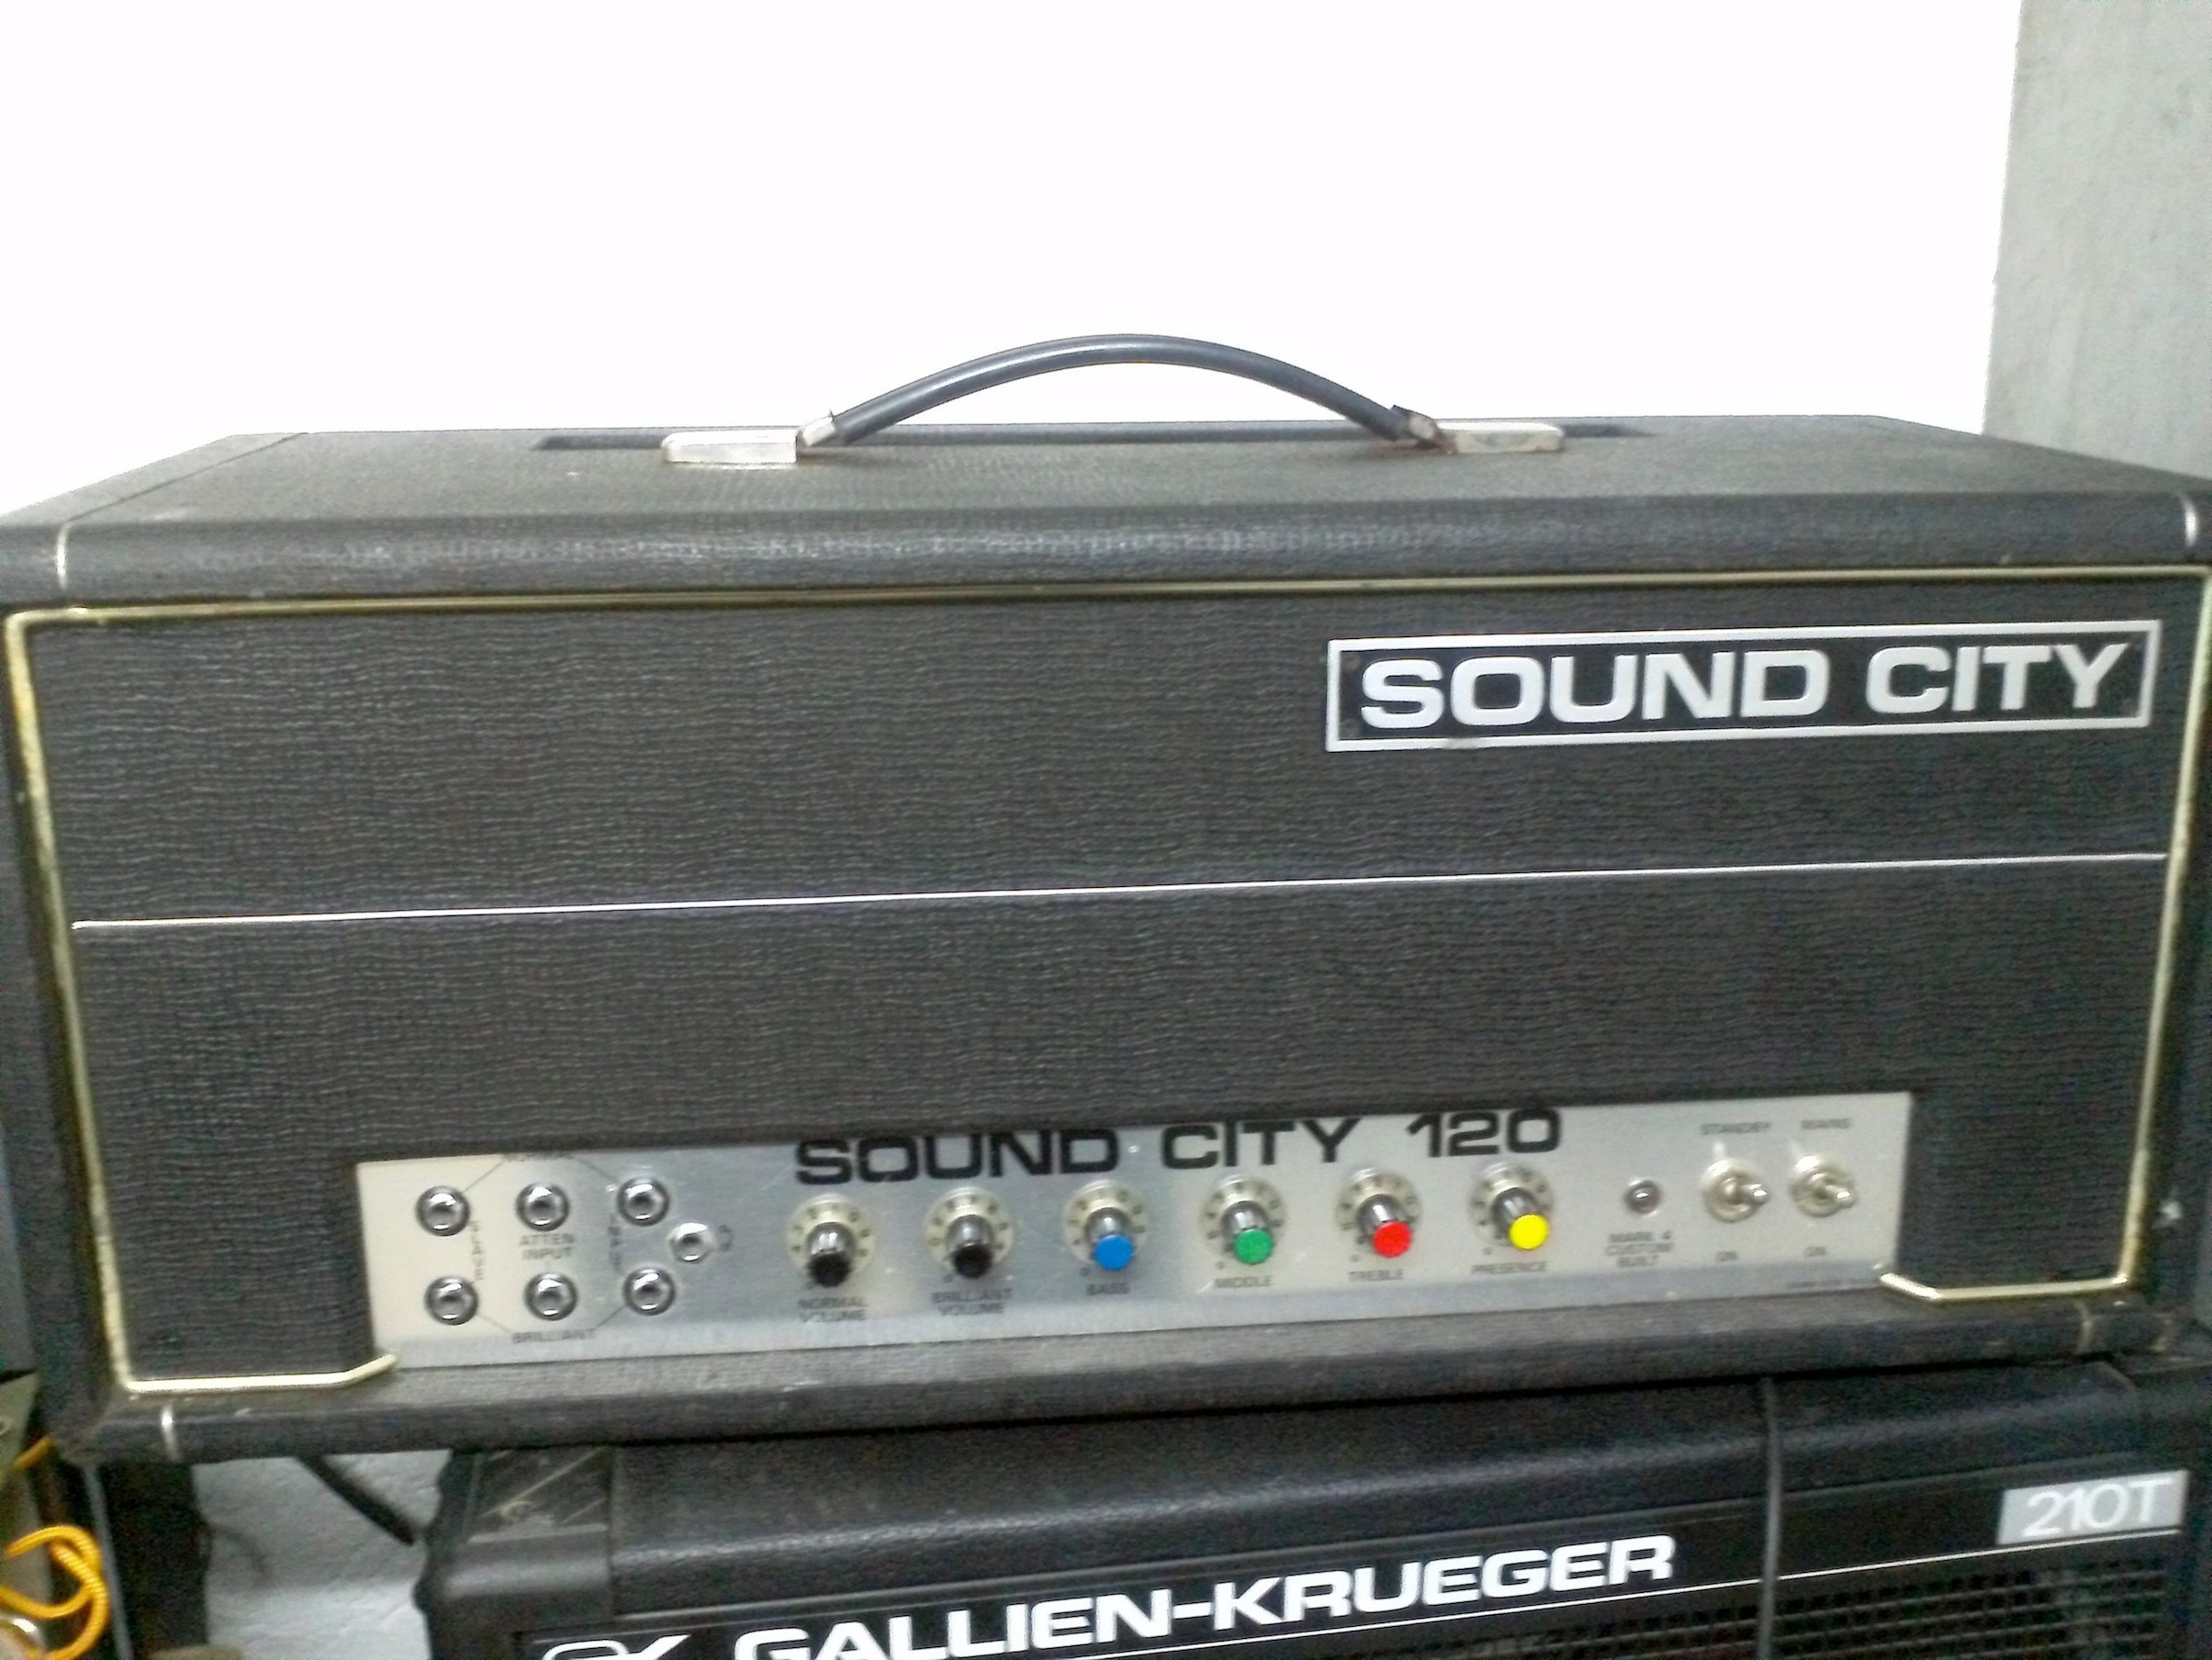 Sound city 120b.jpg